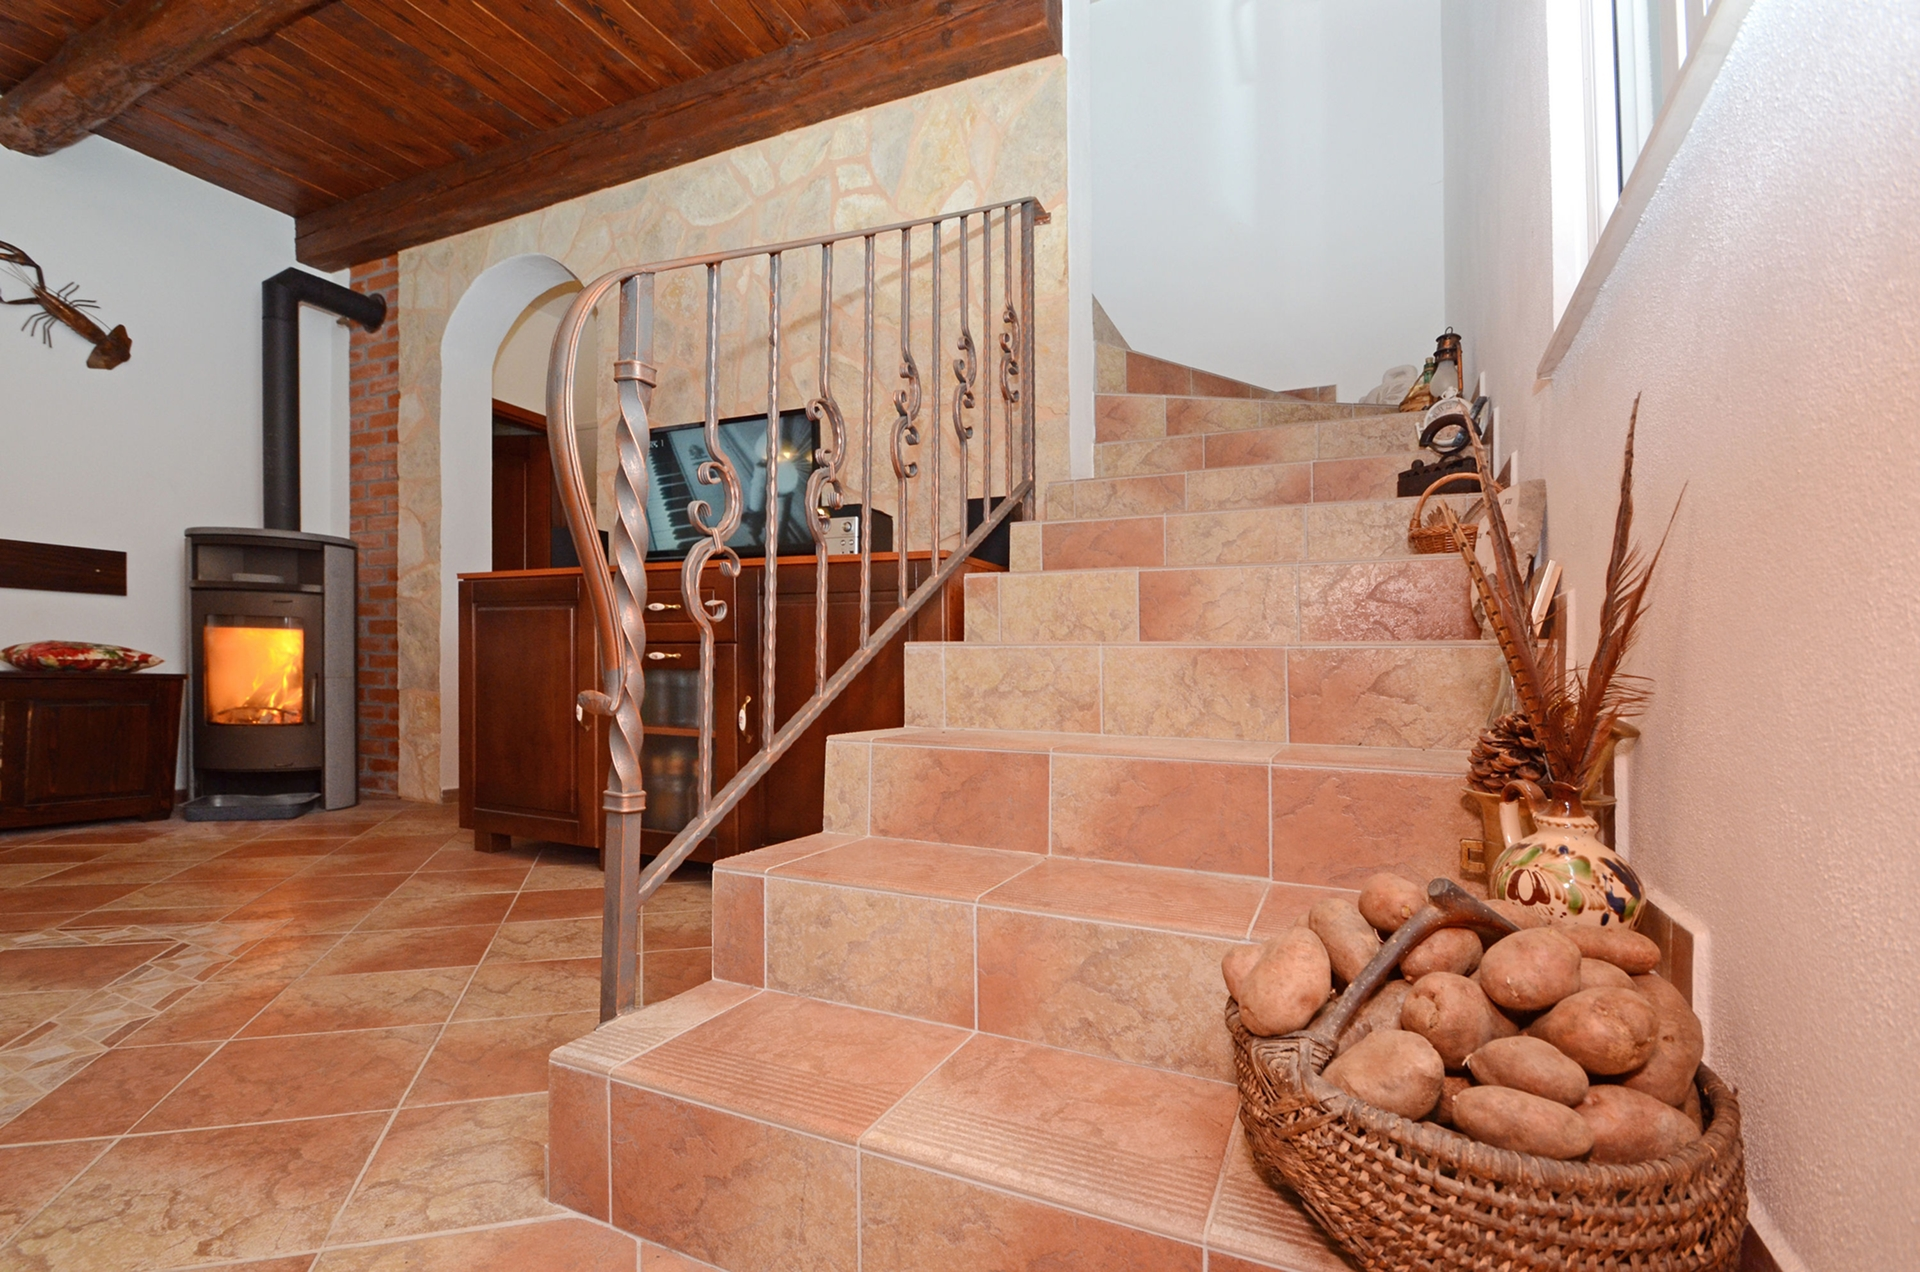 34966 - Prizba - Holiday houses, villas Croatia